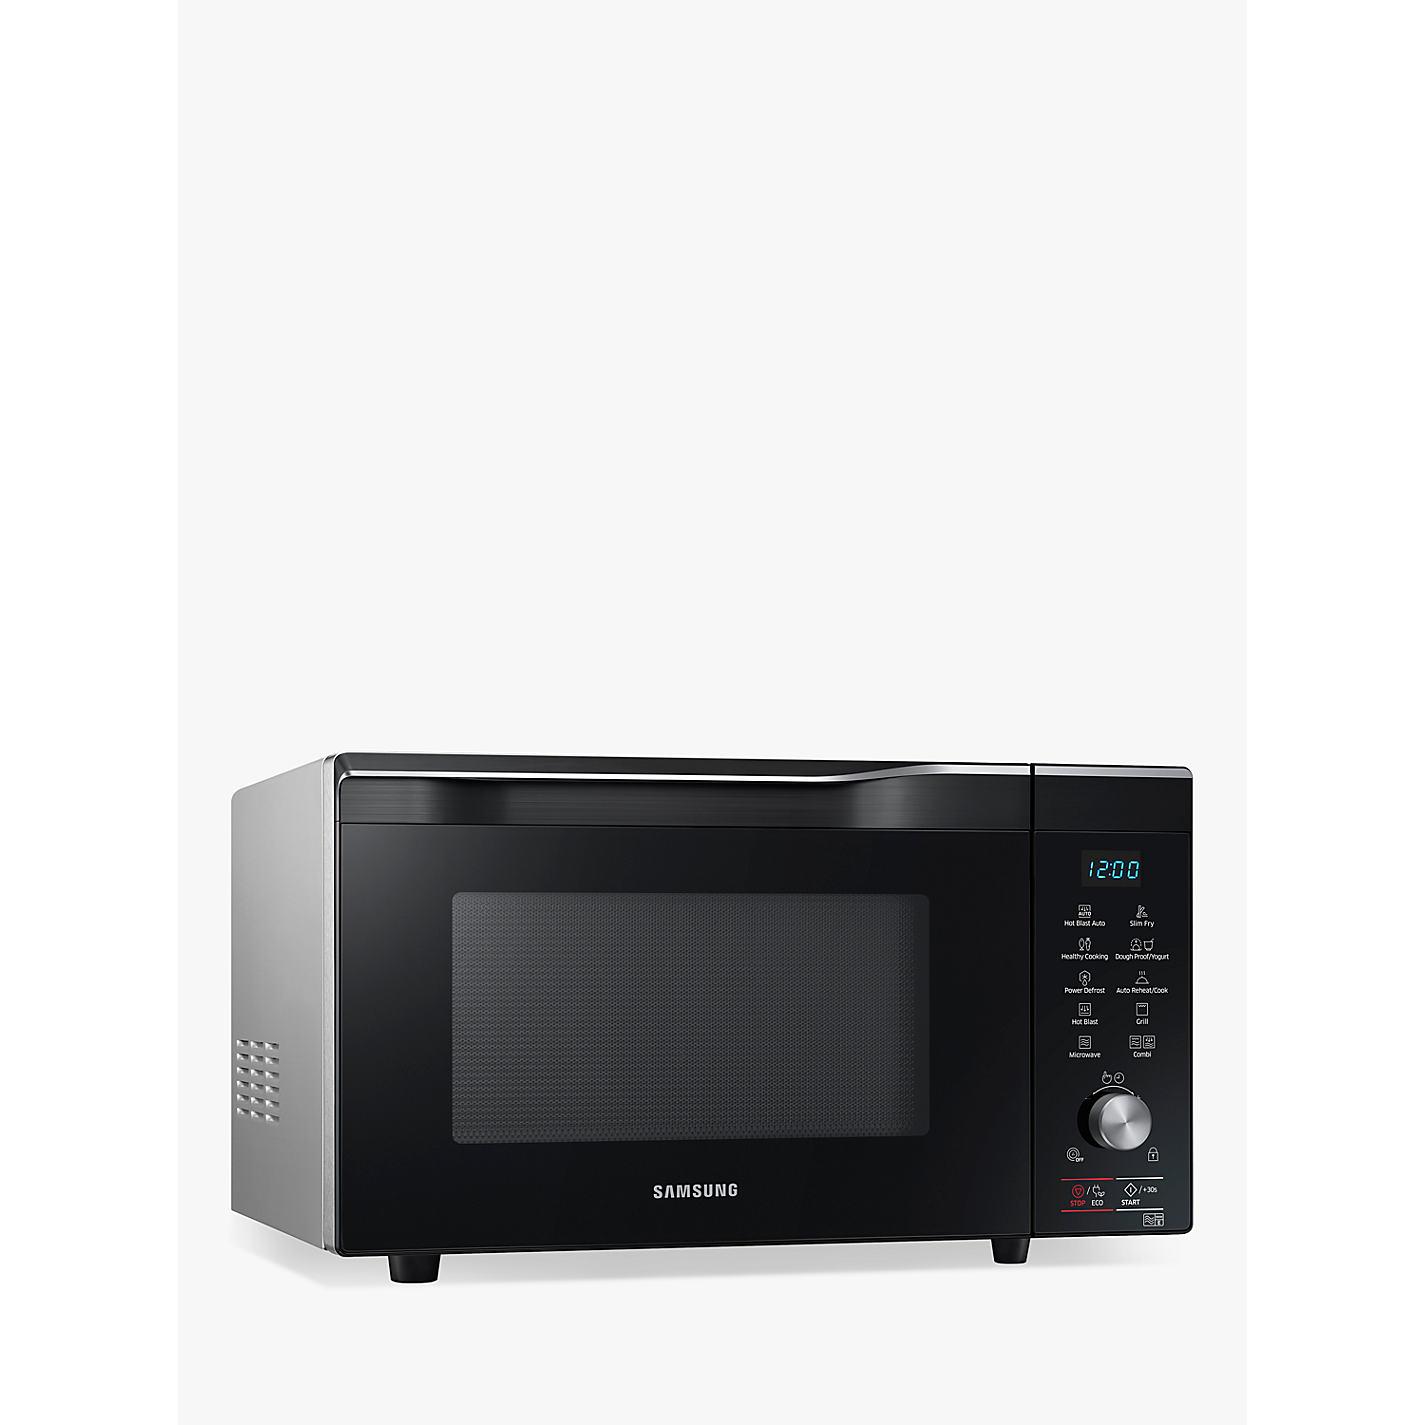 Samsung Mc32k7055ct Eu Freestanding Combination Microwave Oven Black Online At Johnlewis